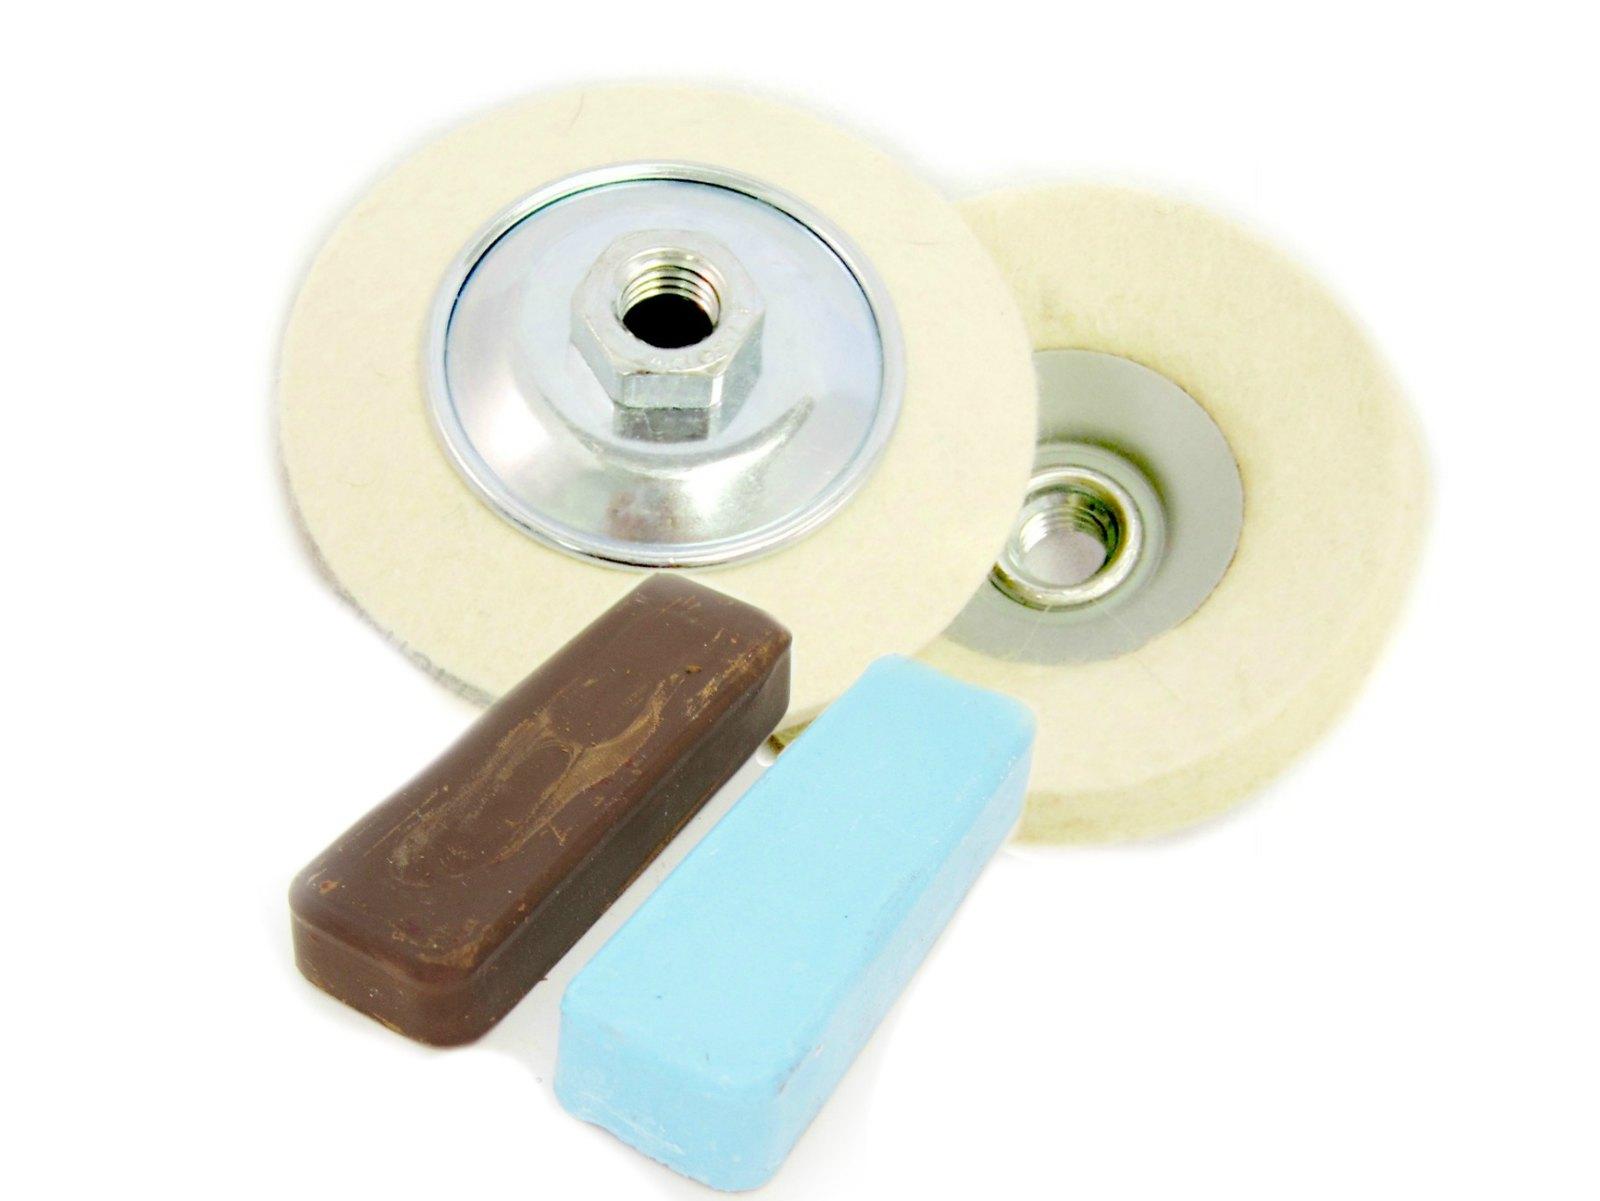 angle grinder polishing kit 43 blue and brown compound for polishing aluminium ebay. Black Bedroom Furniture Sets. Home Design Ideas